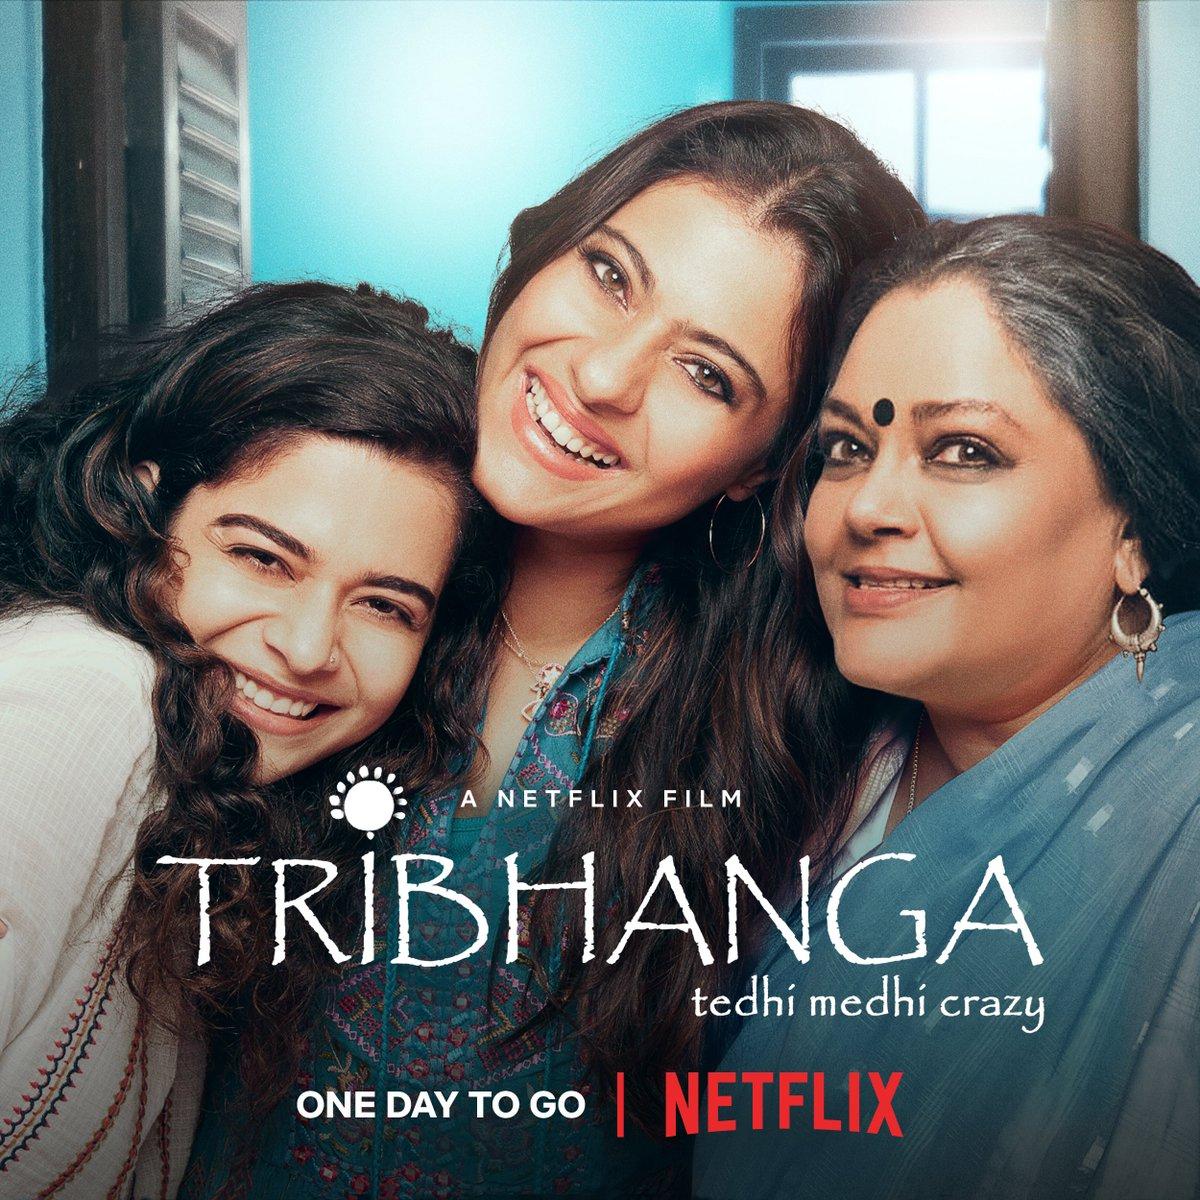 We're all smiles and sunshine, just like these three. #Tribhanga from tomorrow!  @itsKajolD @mipalkar @renukash @ikunaalroykapur @Meena_Iyer @ajaydevgn @ADFFilms @Banijayasia @deepak30000 @NegiR @AlchemyFilms @sidpmalhotra @ParagDesai @KumarMangat